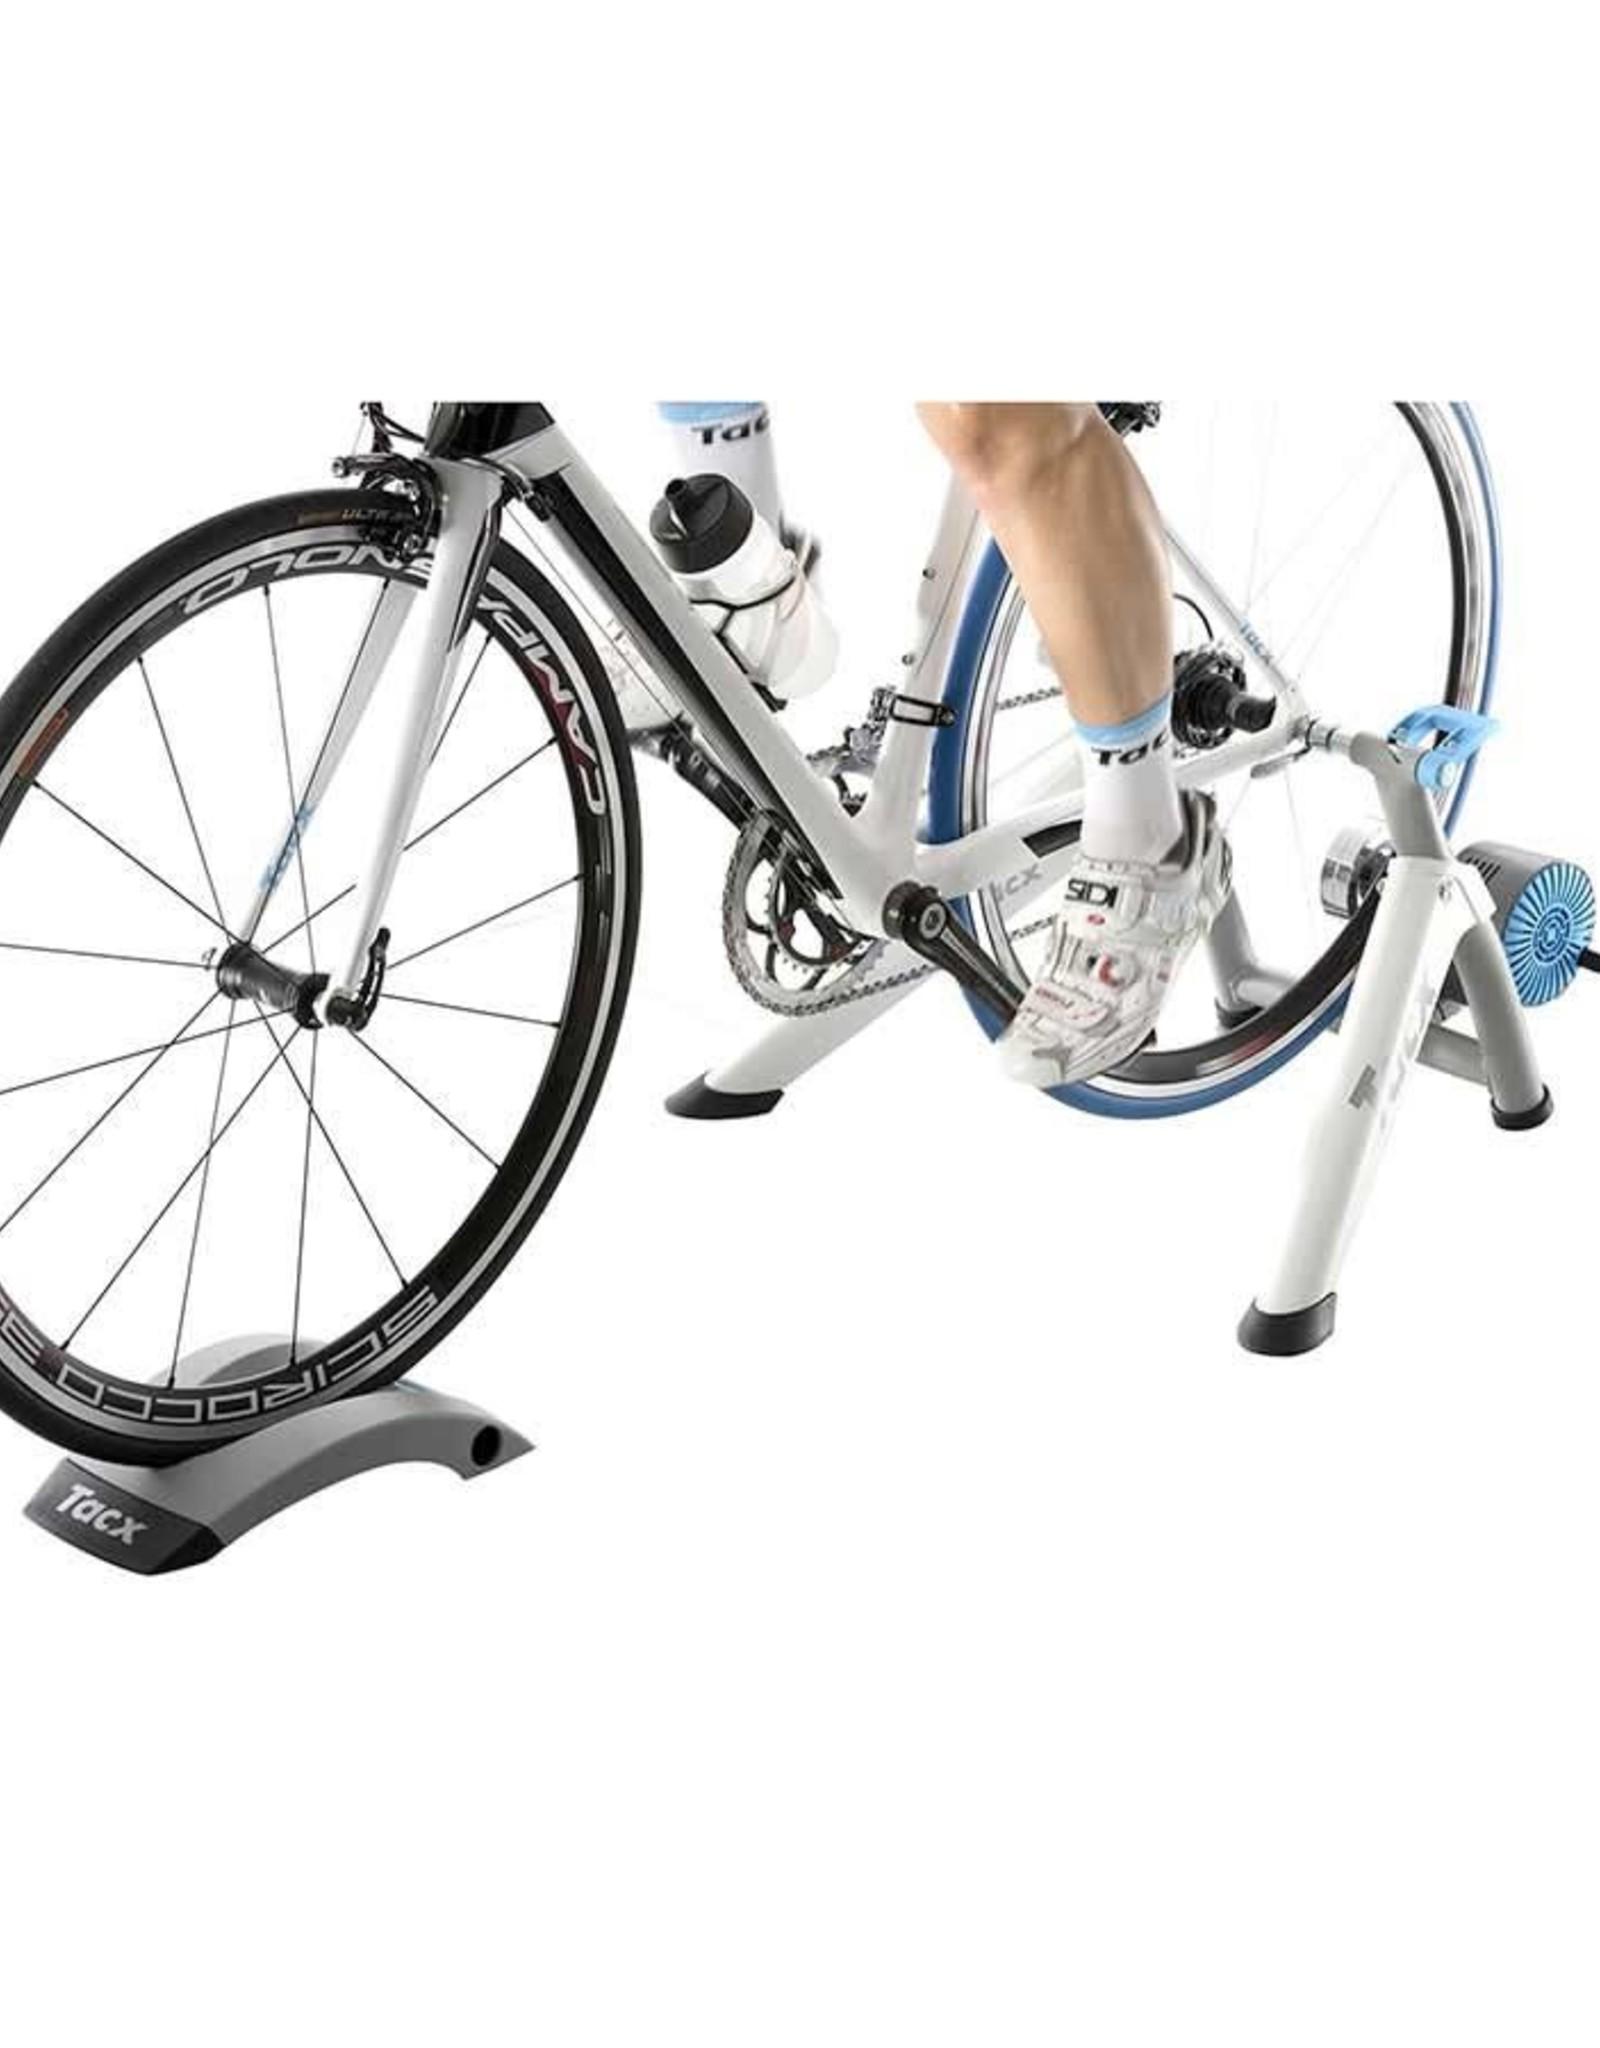 Tacx, Flow Smart, Trainer, Magnetic